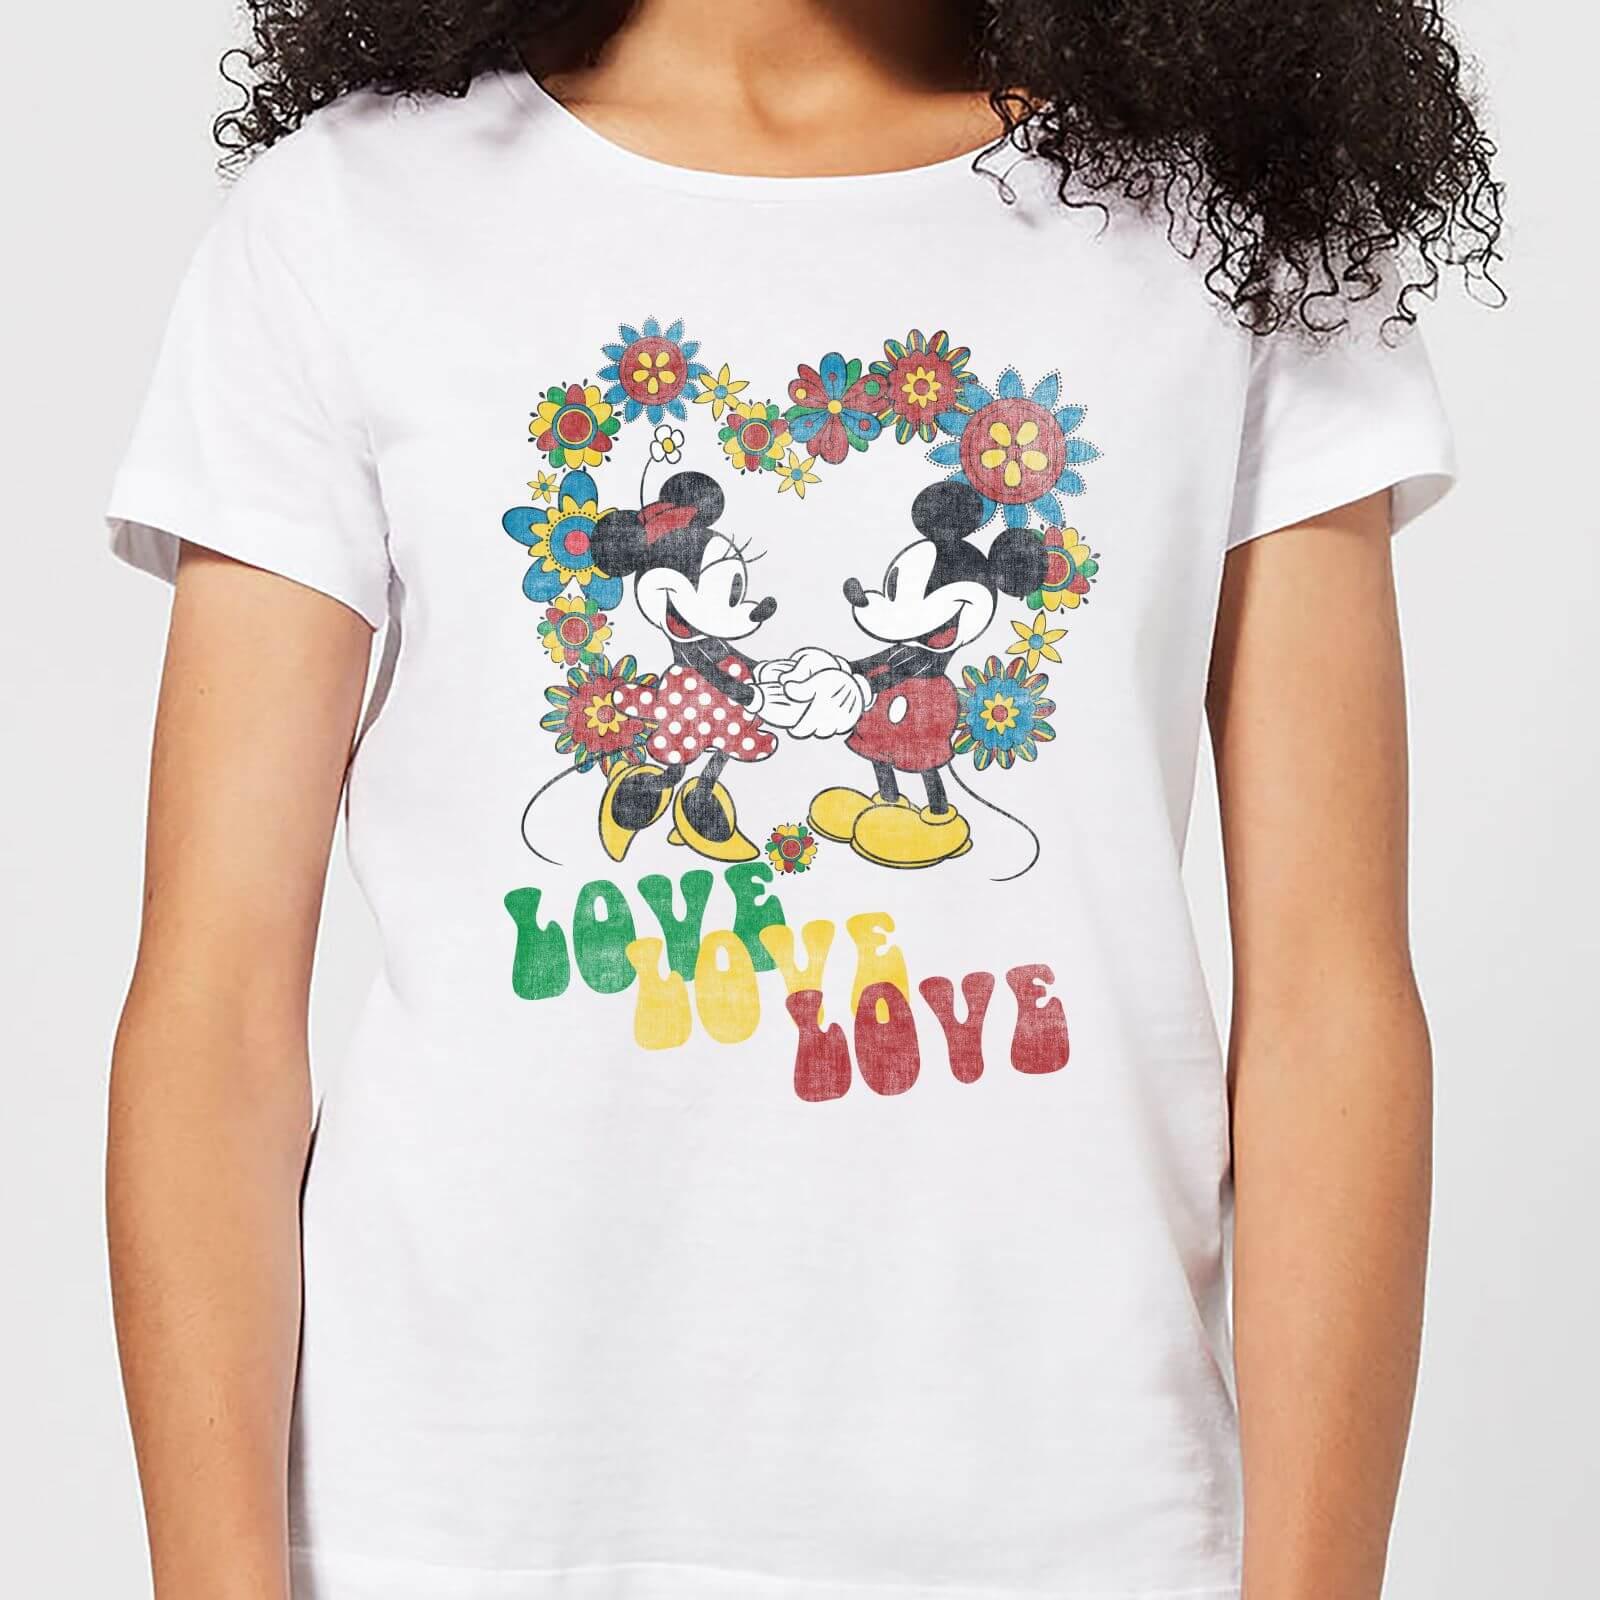 Disney Mickey Mouse Hippie Love Women's T-Shirt - White - 4XL - White